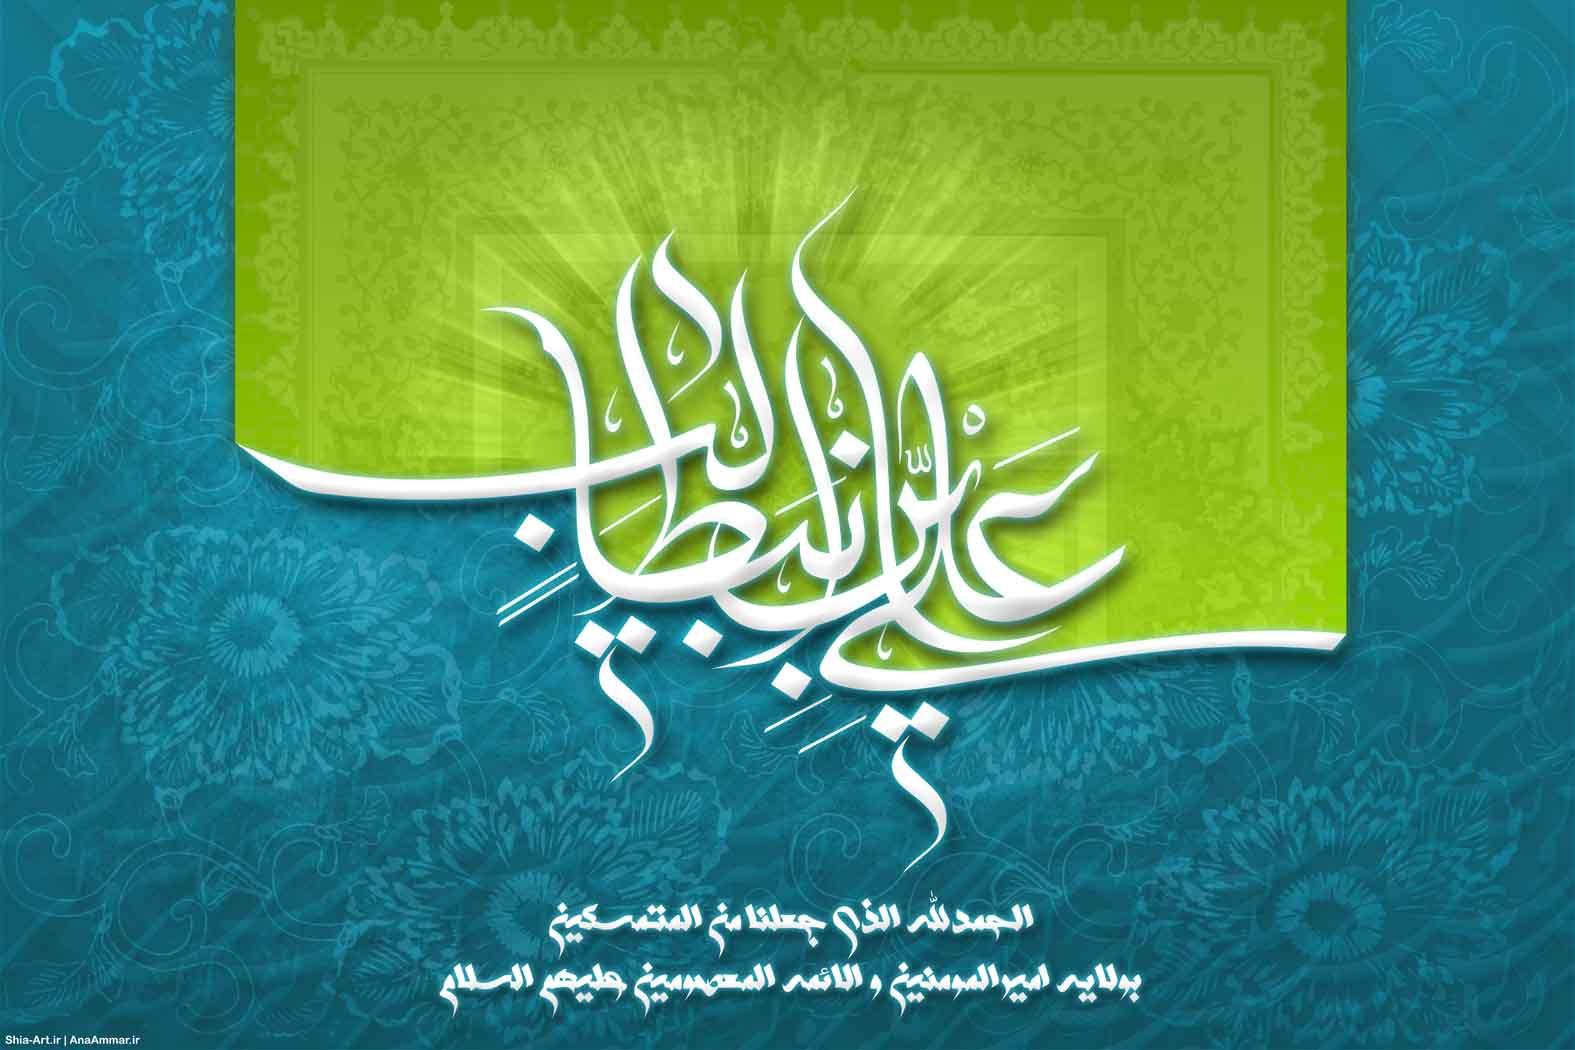 امام علي علیه السلام مصداق كامل اسوه حسنه